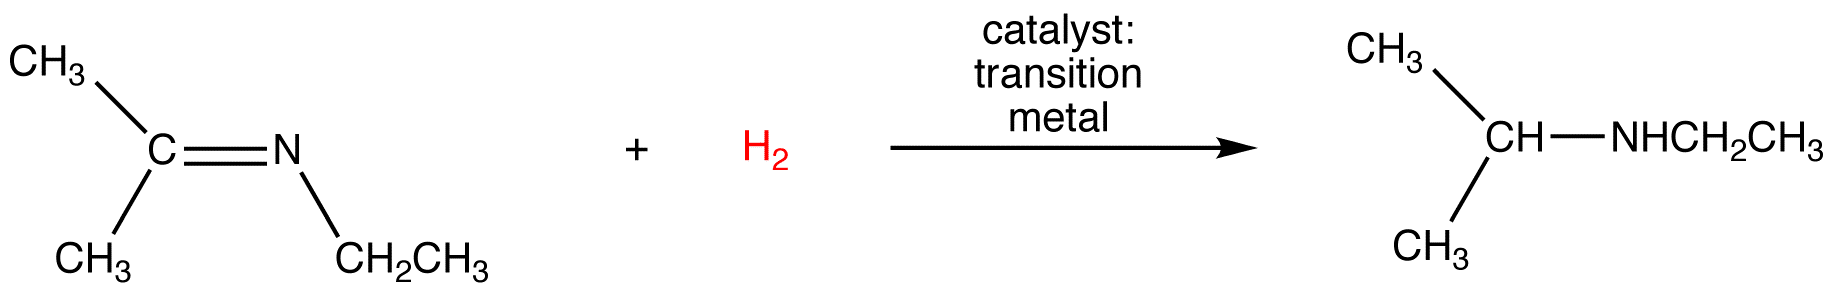 Catalytic Hydrogenation Ochempal